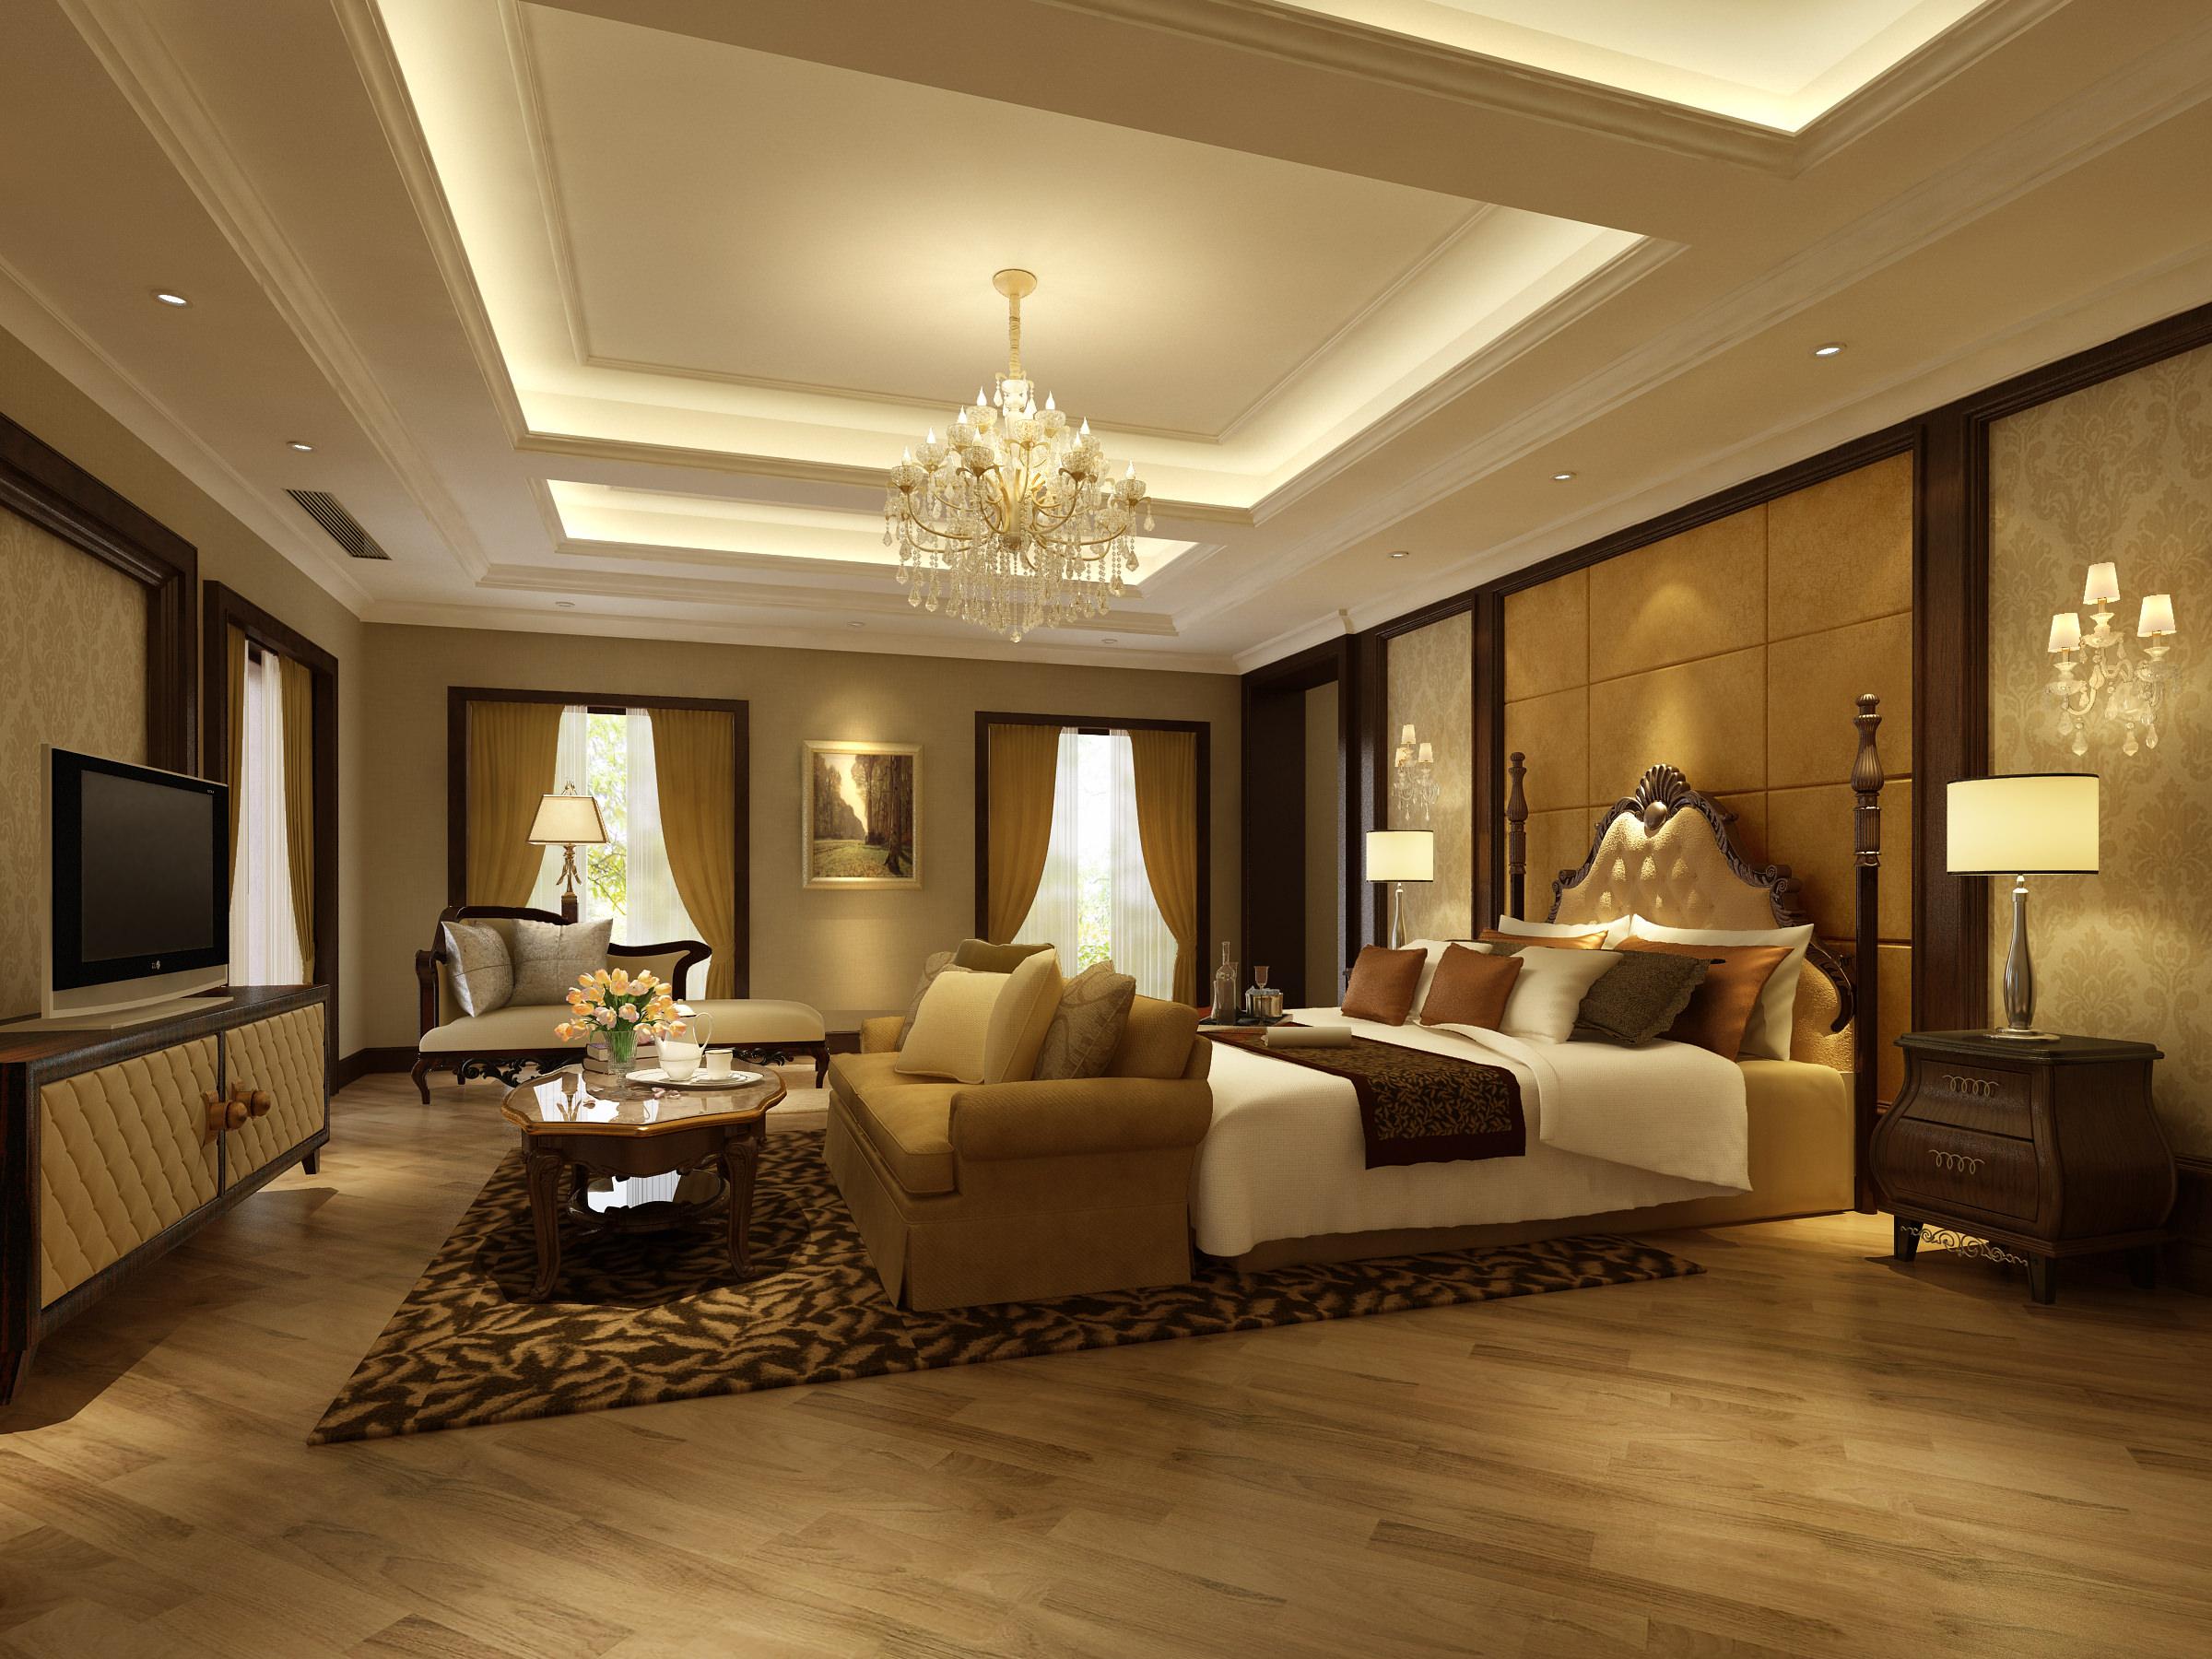 bedroom or hotel room 3d model max 1. Bedroom or Hotel Room 3D Model MAX   CGTrader com